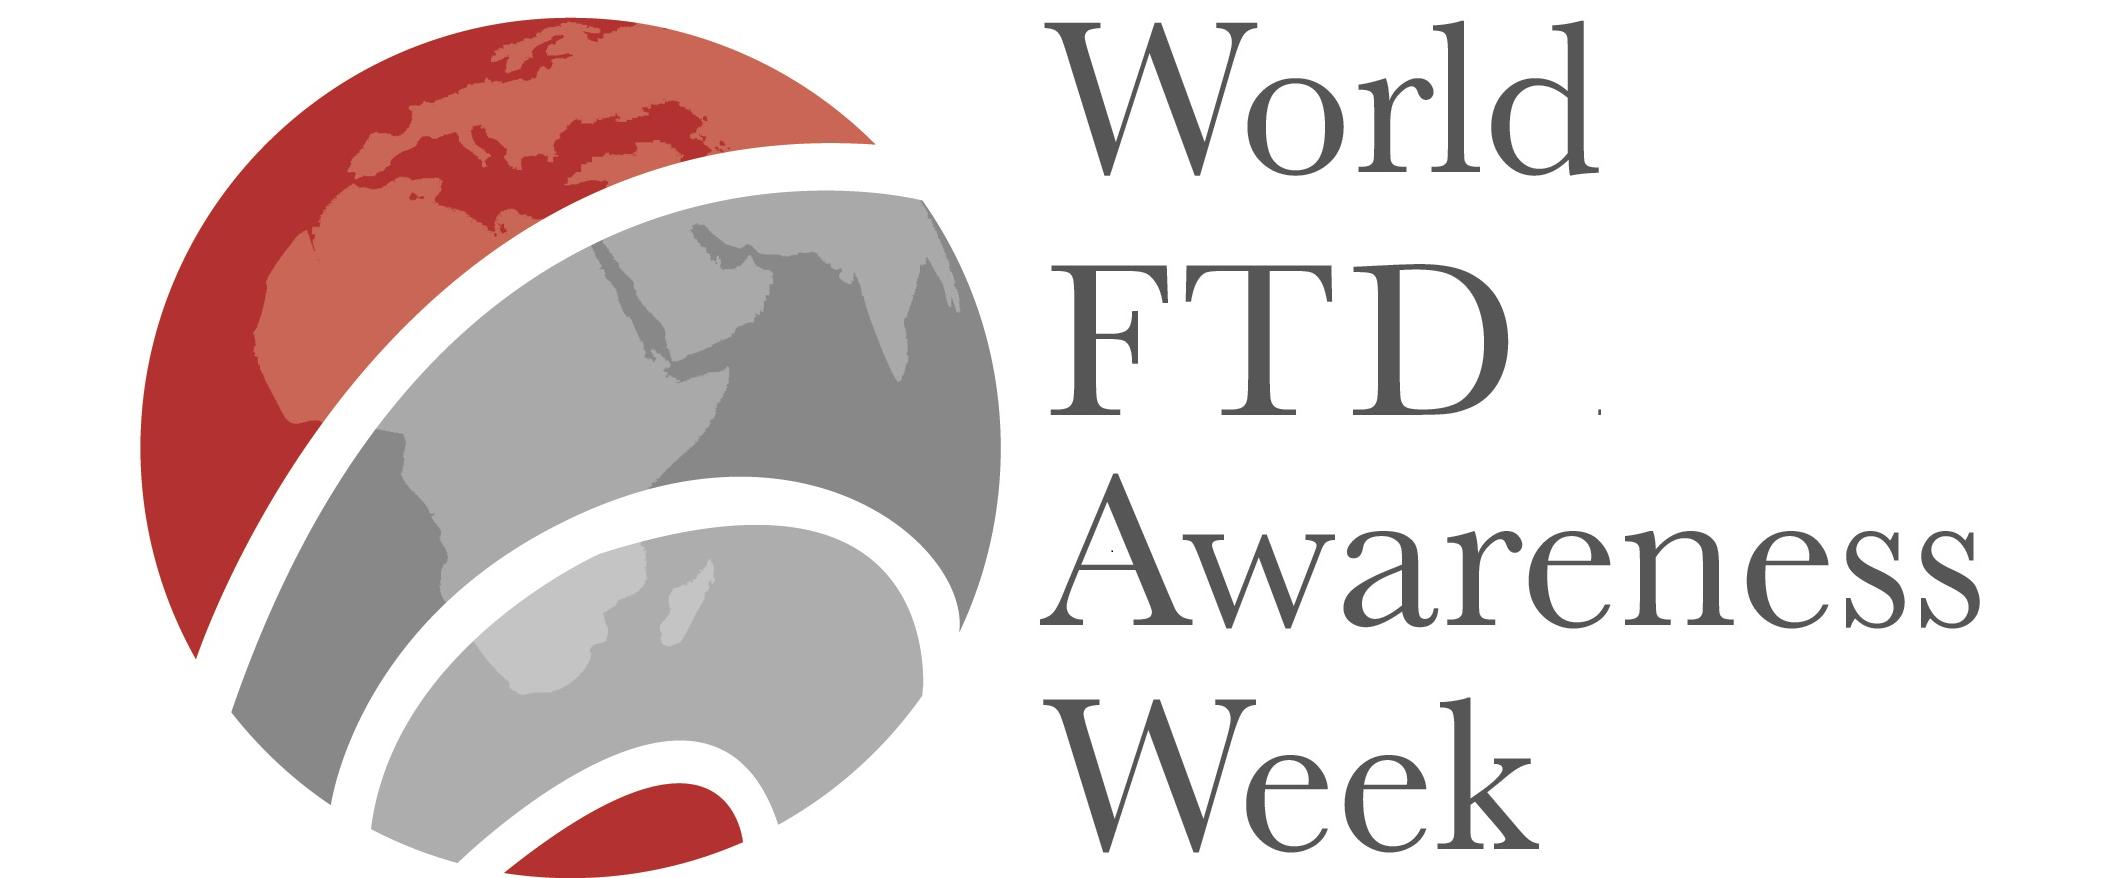 FTD-WorldAwarenessWeek_logo.jpg